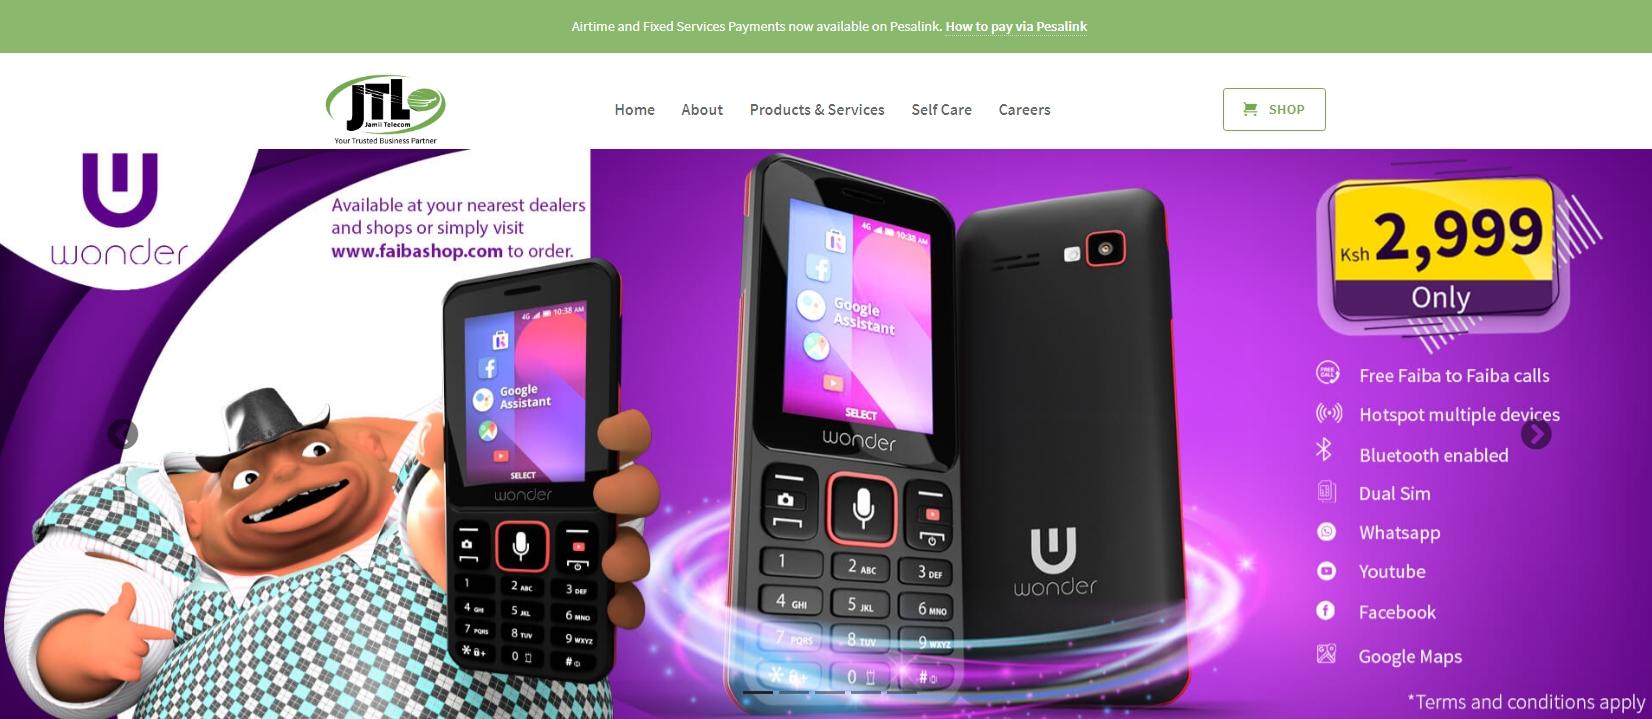 Faiba by Jamii Telecommunications Limited (JTL)